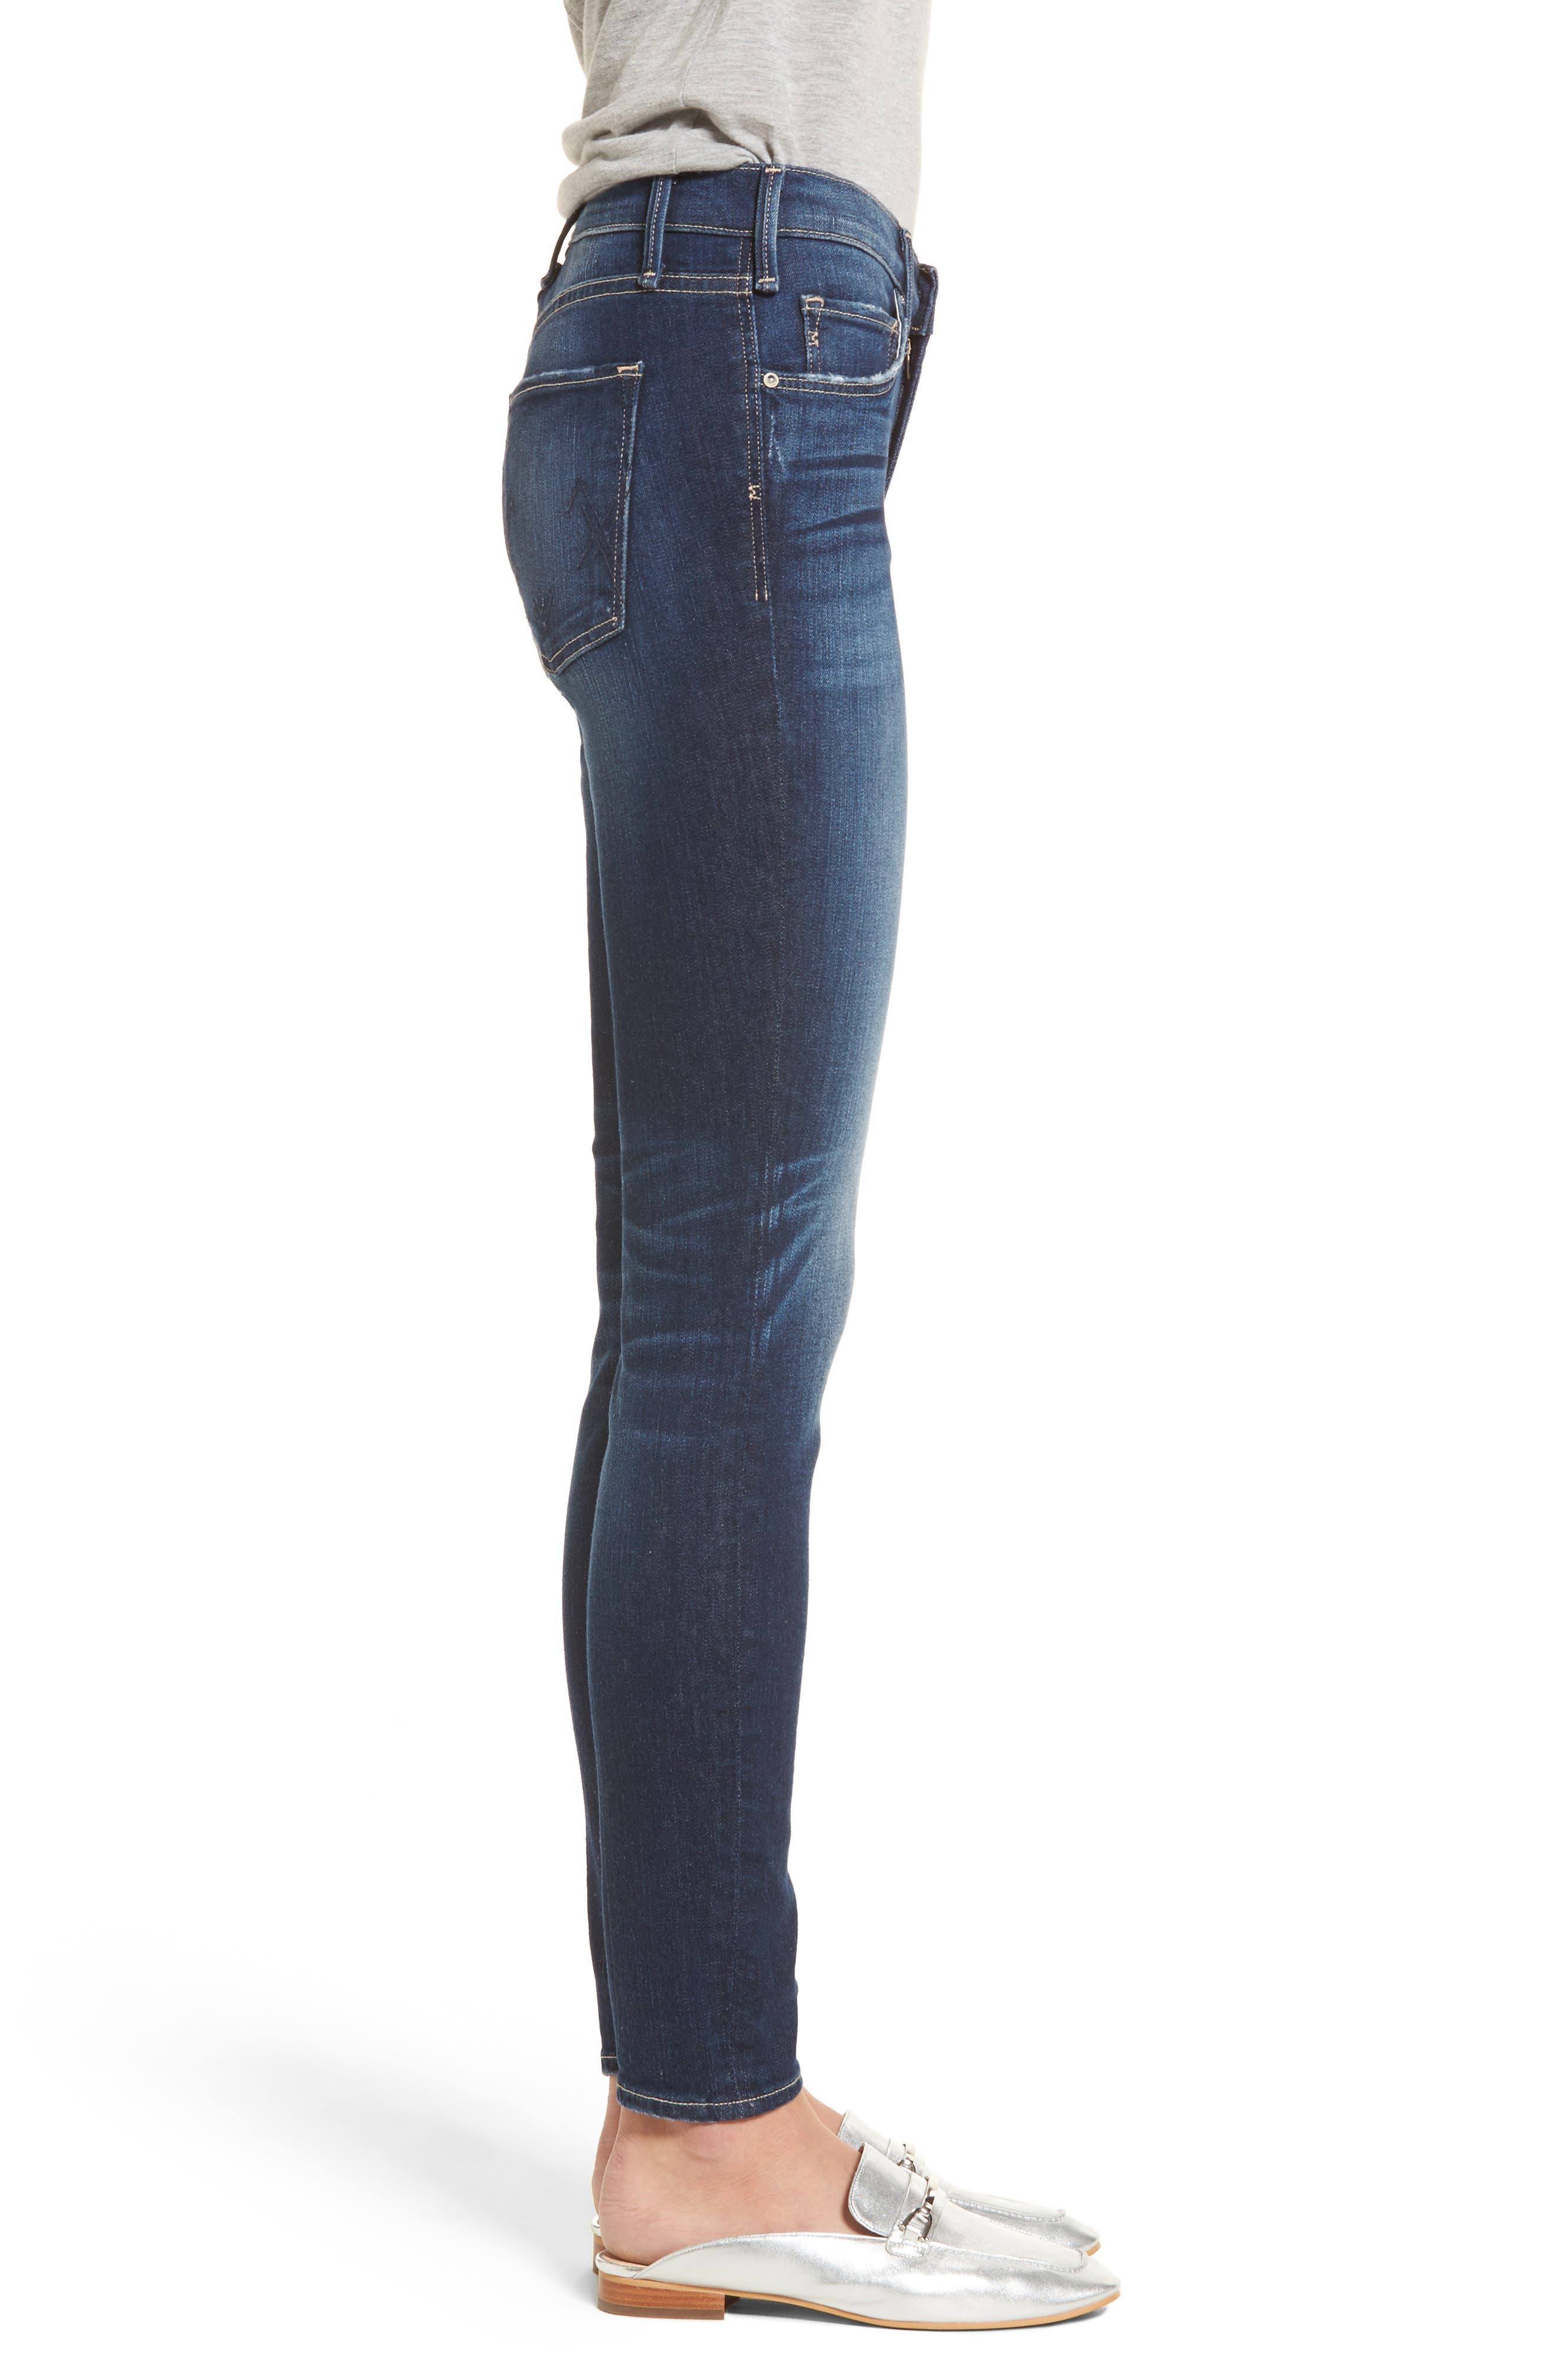 Newton Skinny Jeans,                             Alternate thumbnail 3, color,                             Chateau